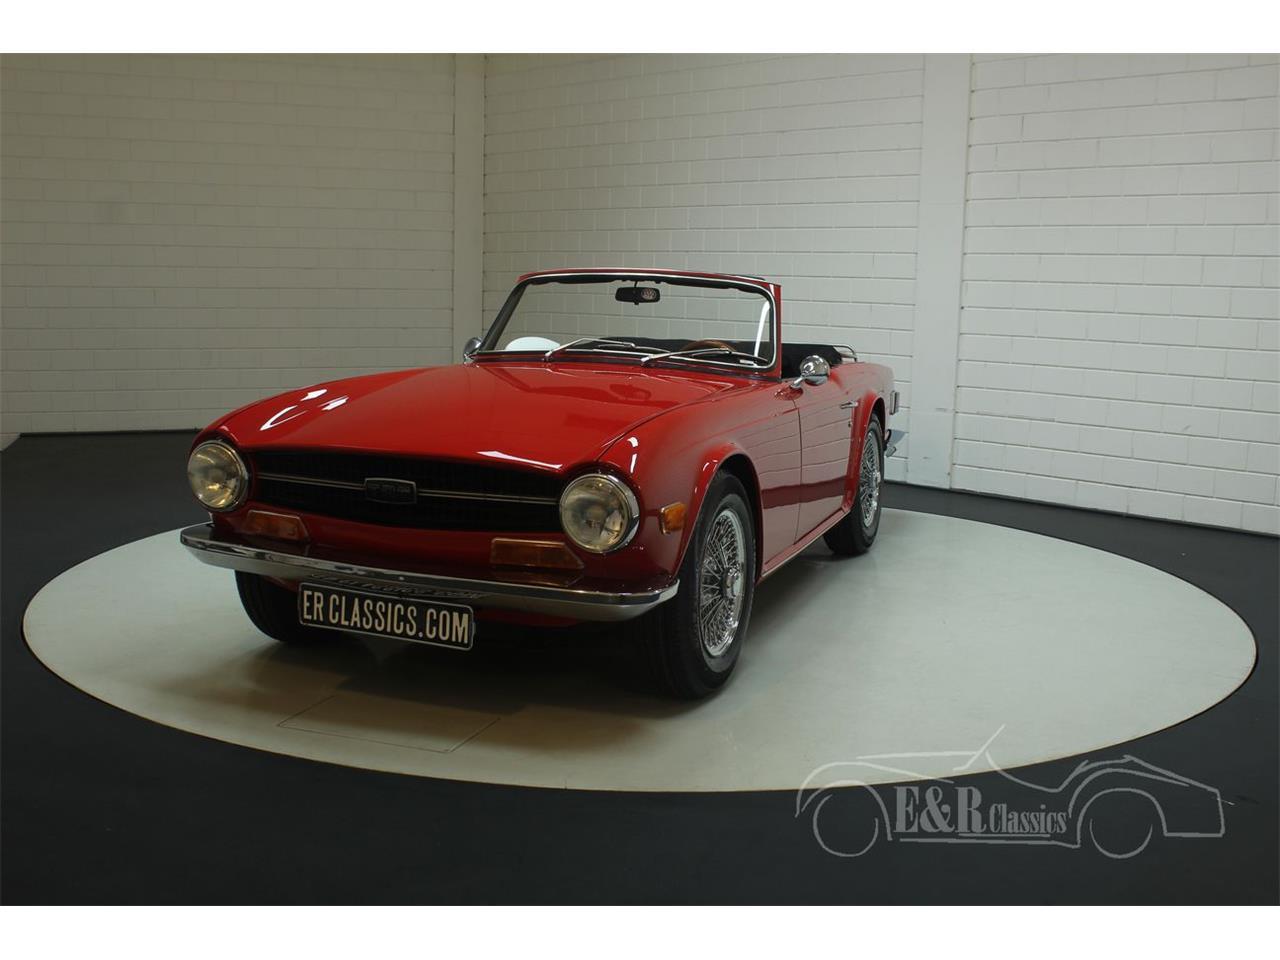 1969 Triumph TR6 (CC-1304166) for sale in Waalwijk, Noord-Brabant